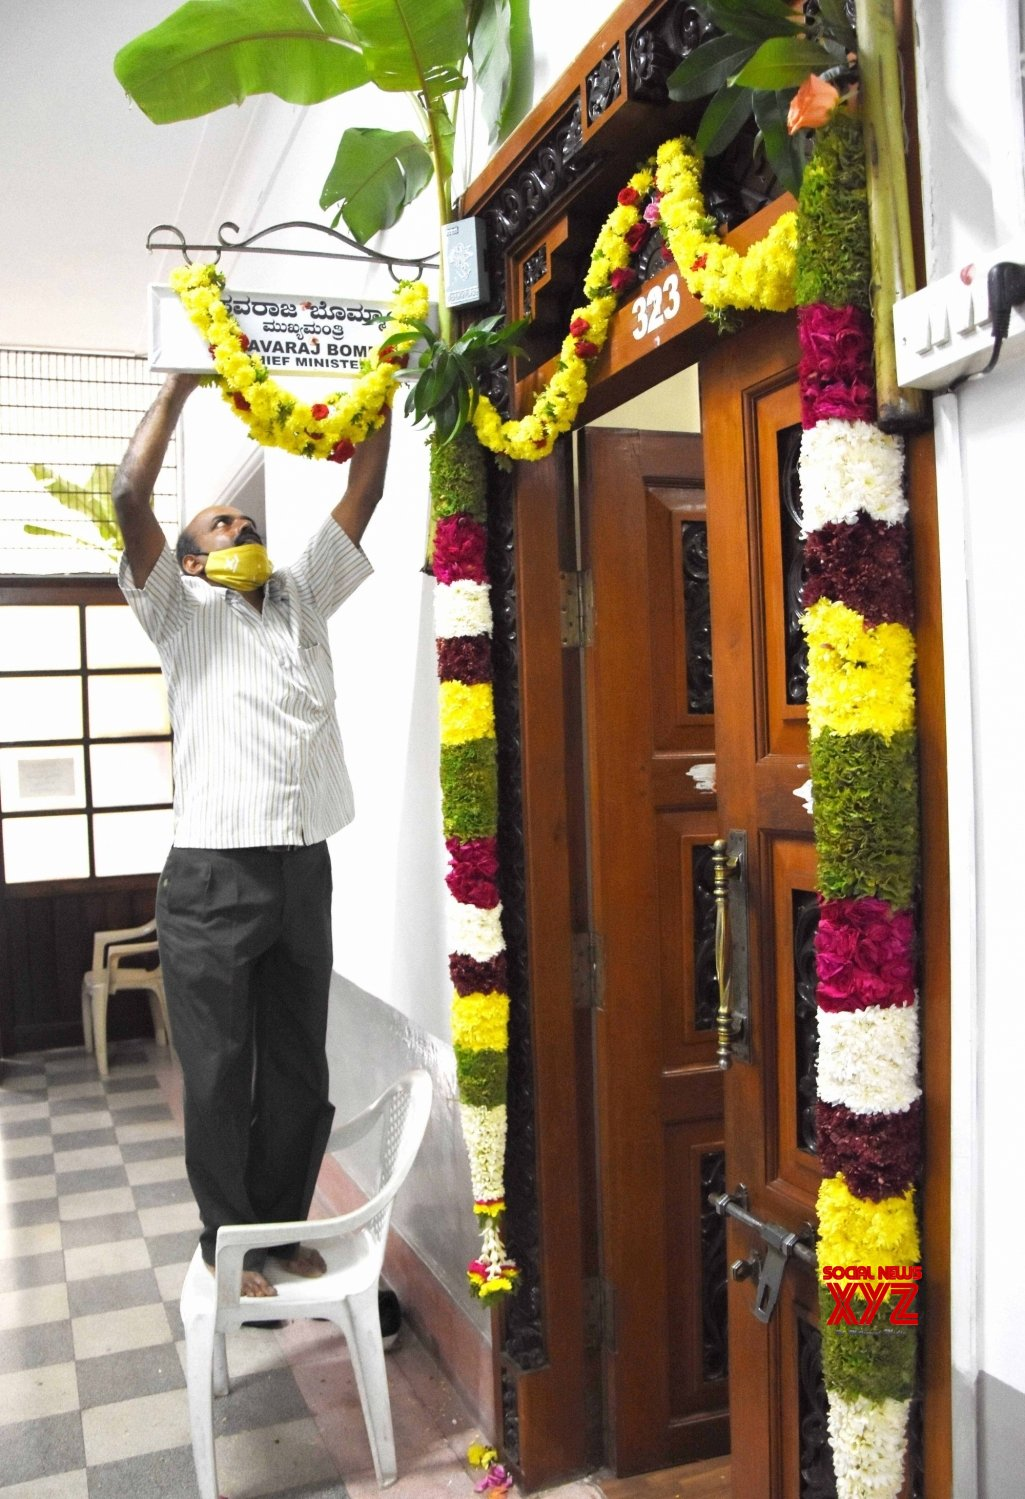 Staff Perform pooja at Government office, Vidhana Soudha and Vikasa Soudha on the eve of Ayudha Pooja, #Gallery